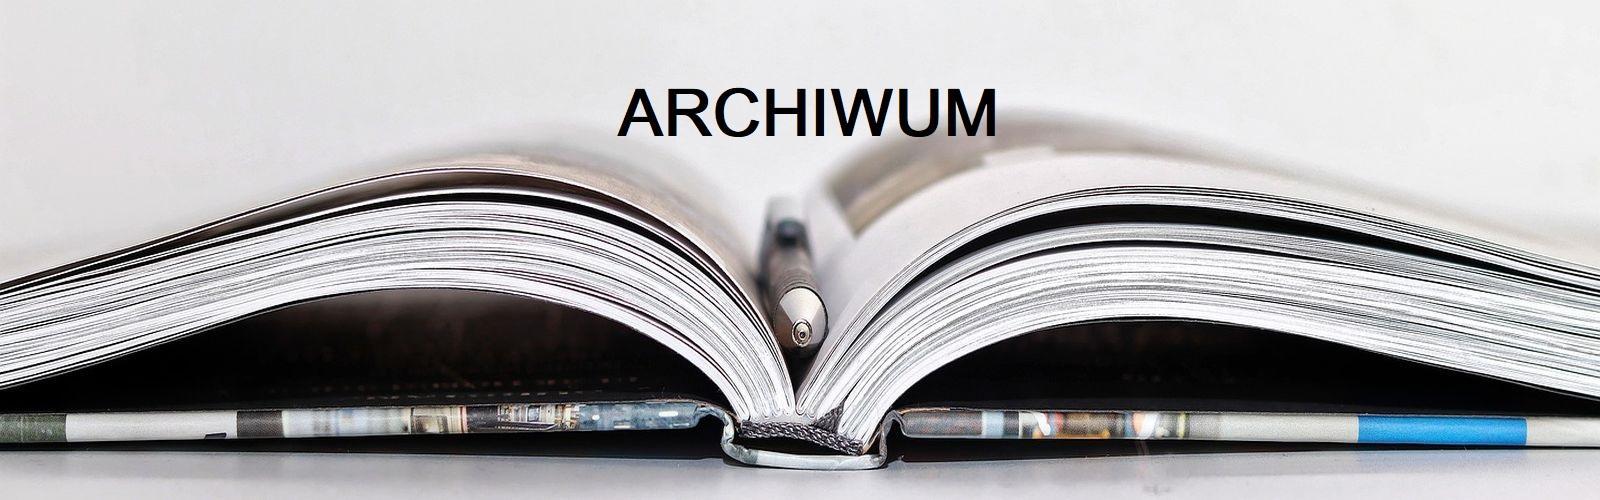 Archiwum_baner